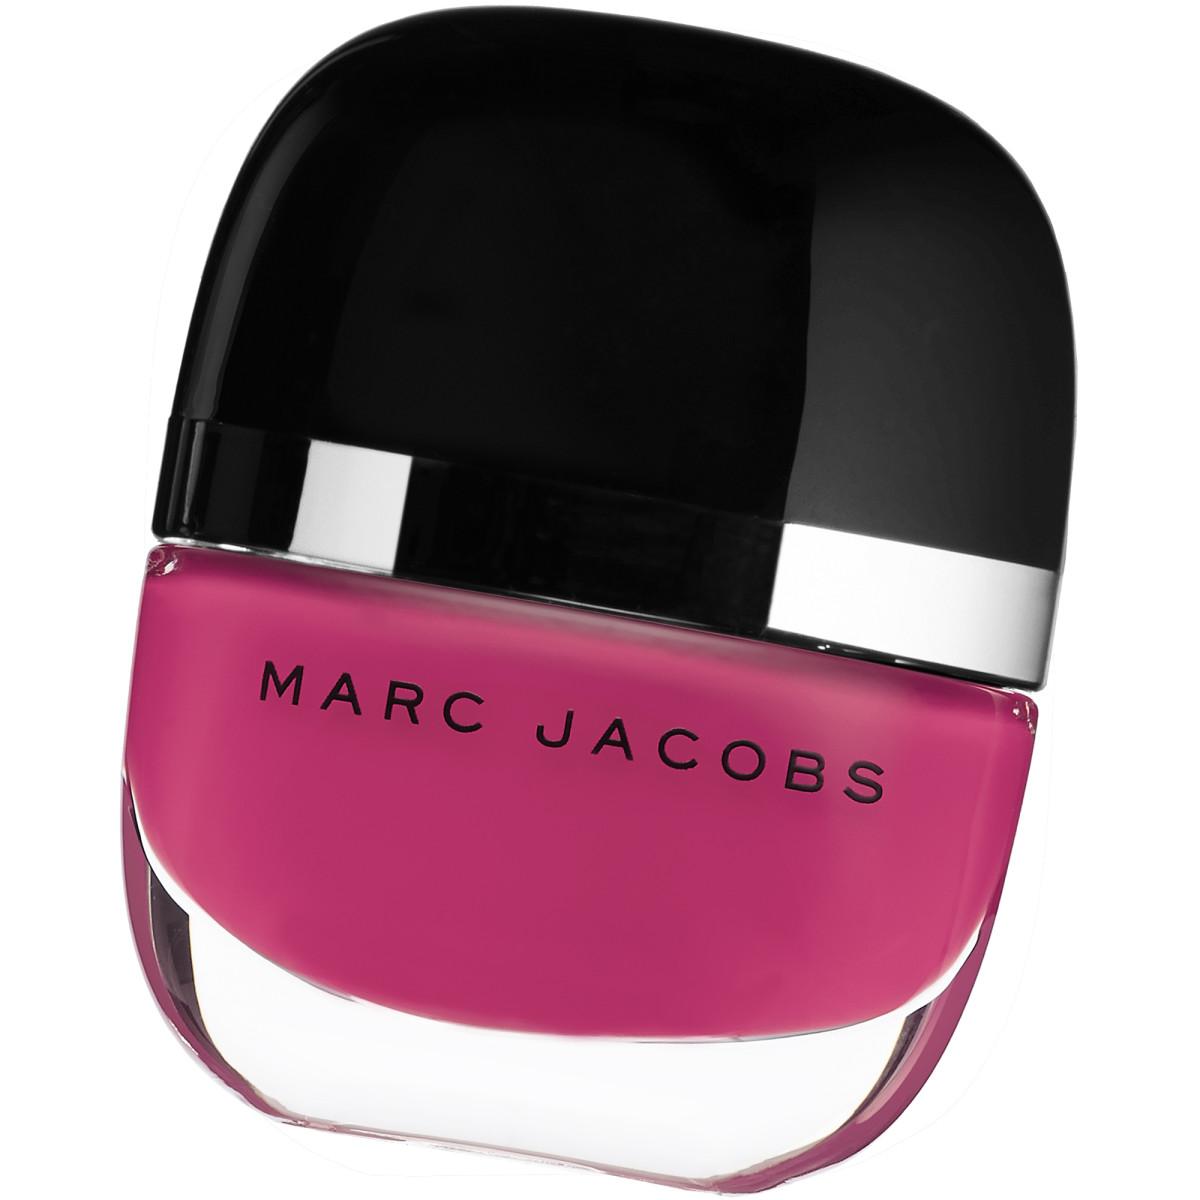 Marc Jacobs Enamored Hi-Shine Lacquer nail polish